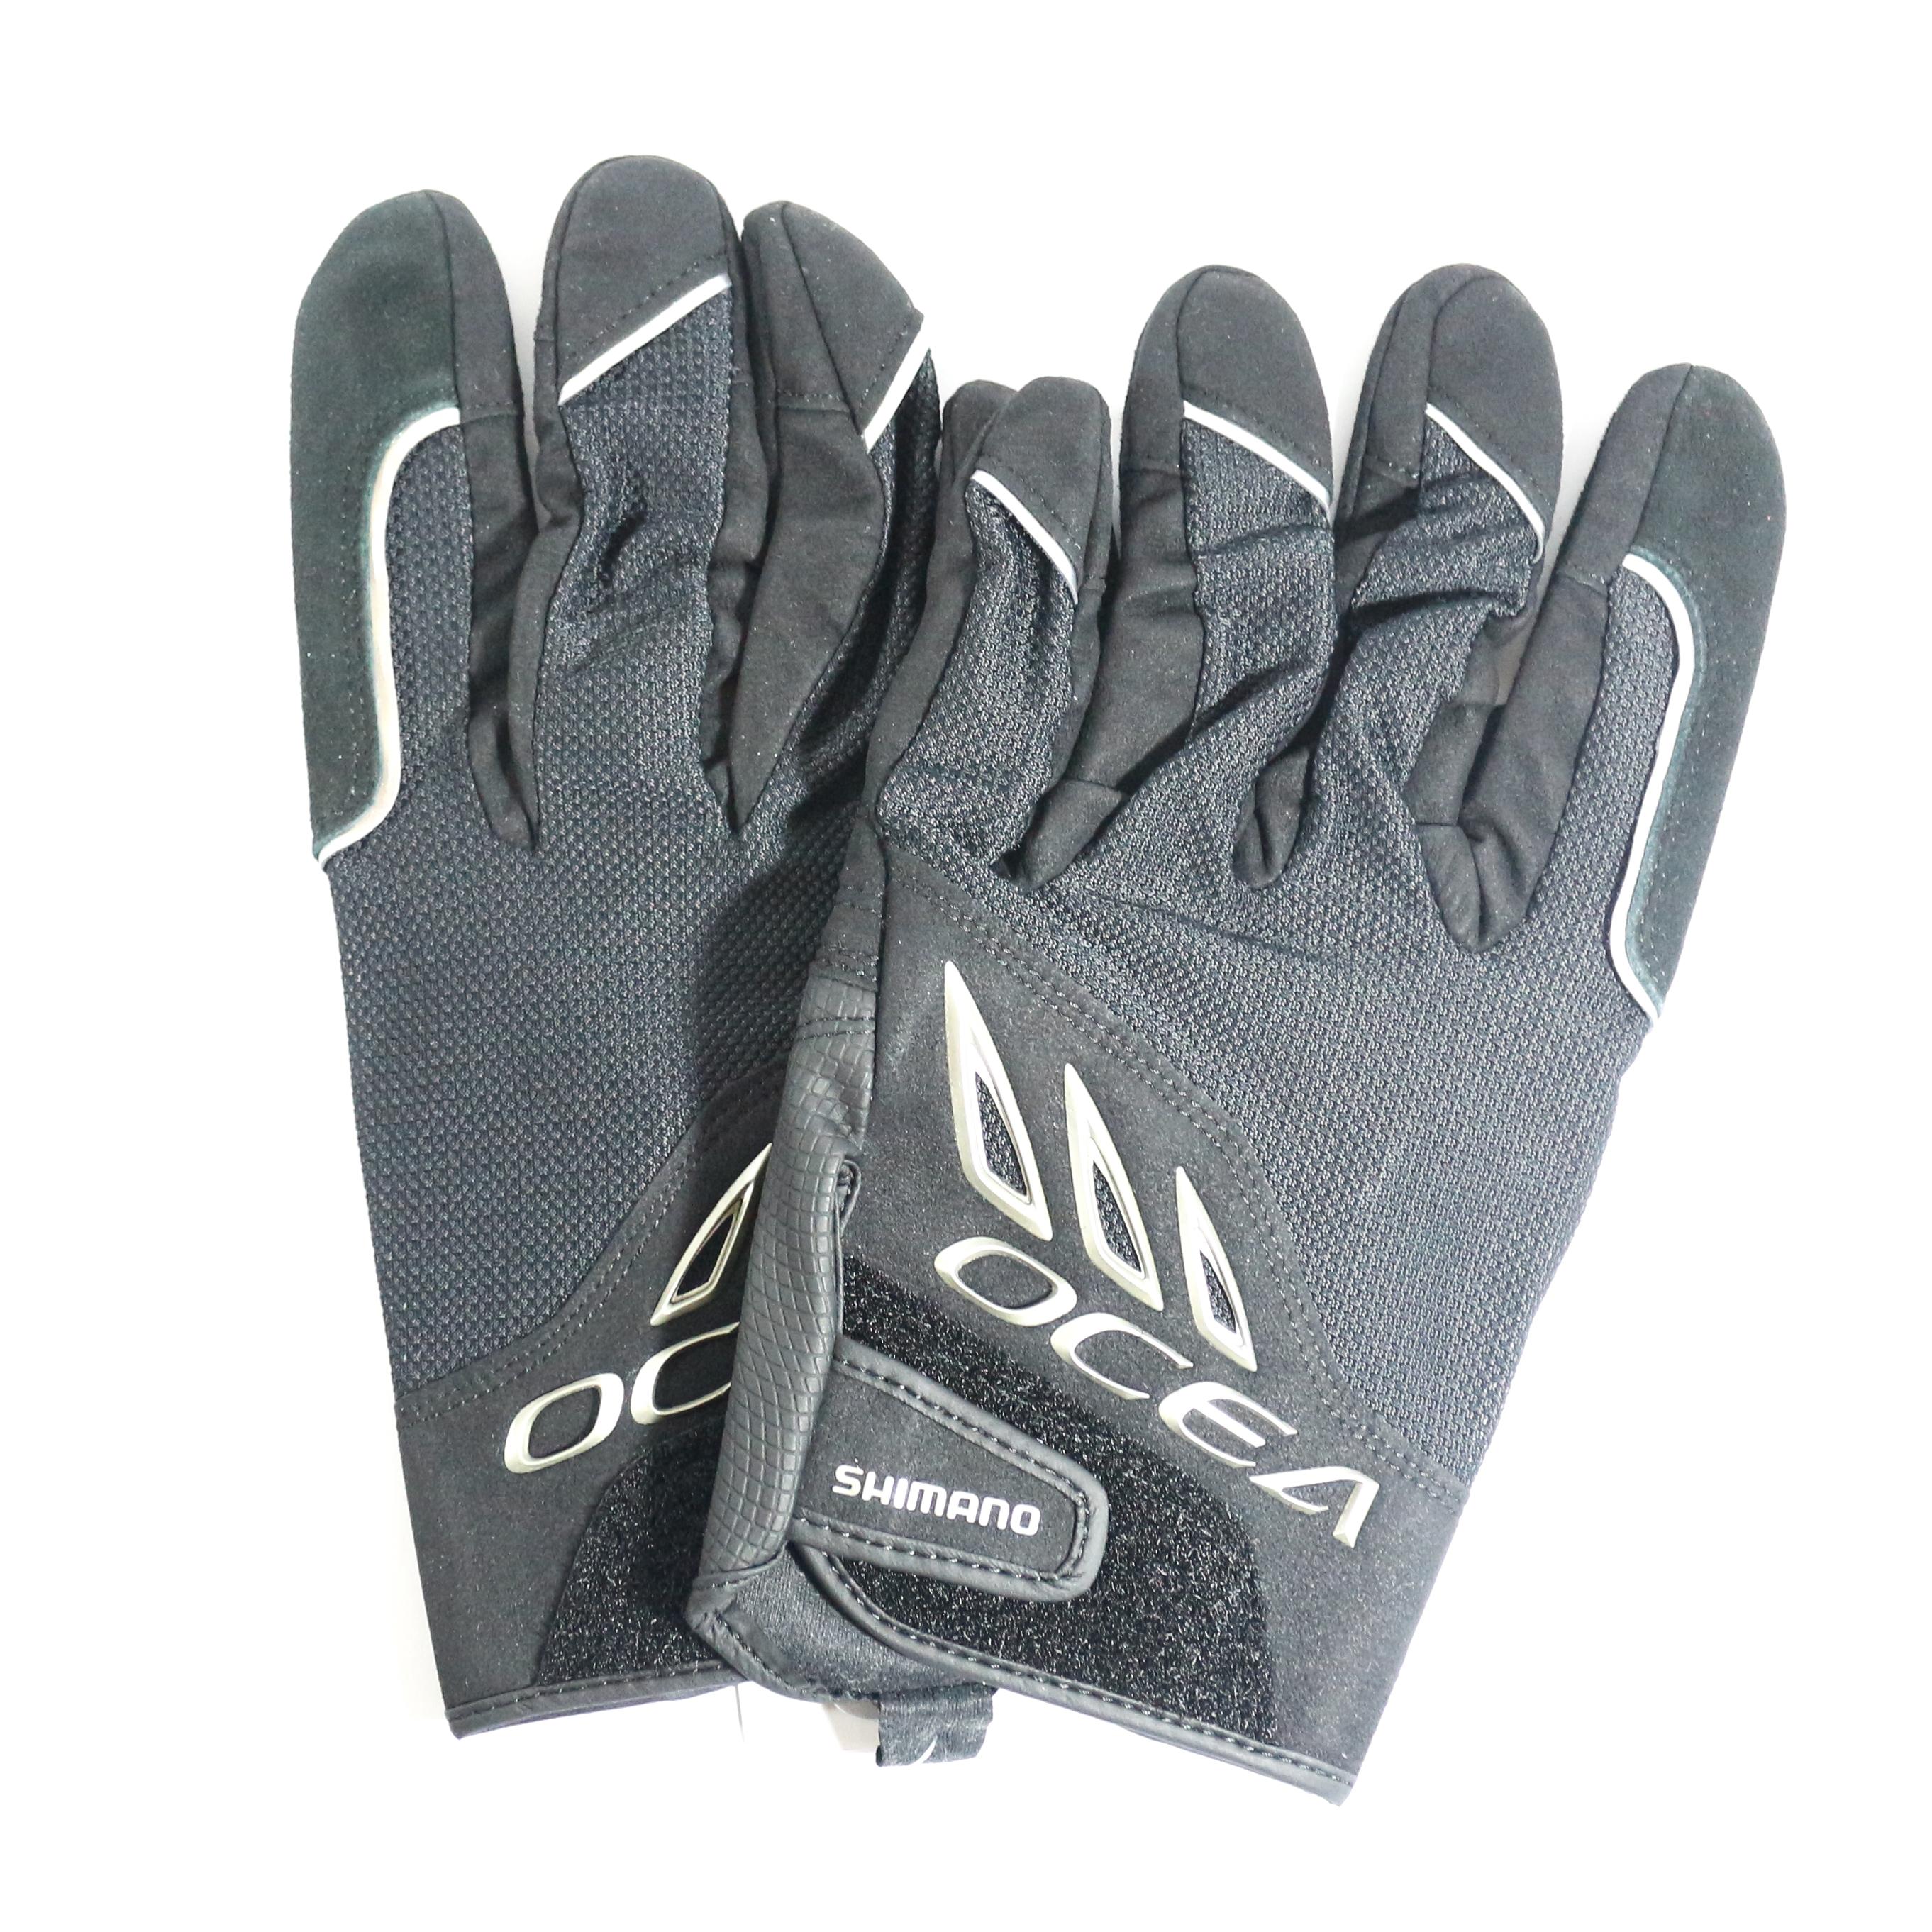 Shimano GL-293Q Gloves Big Game Casting Black Size XL 479563